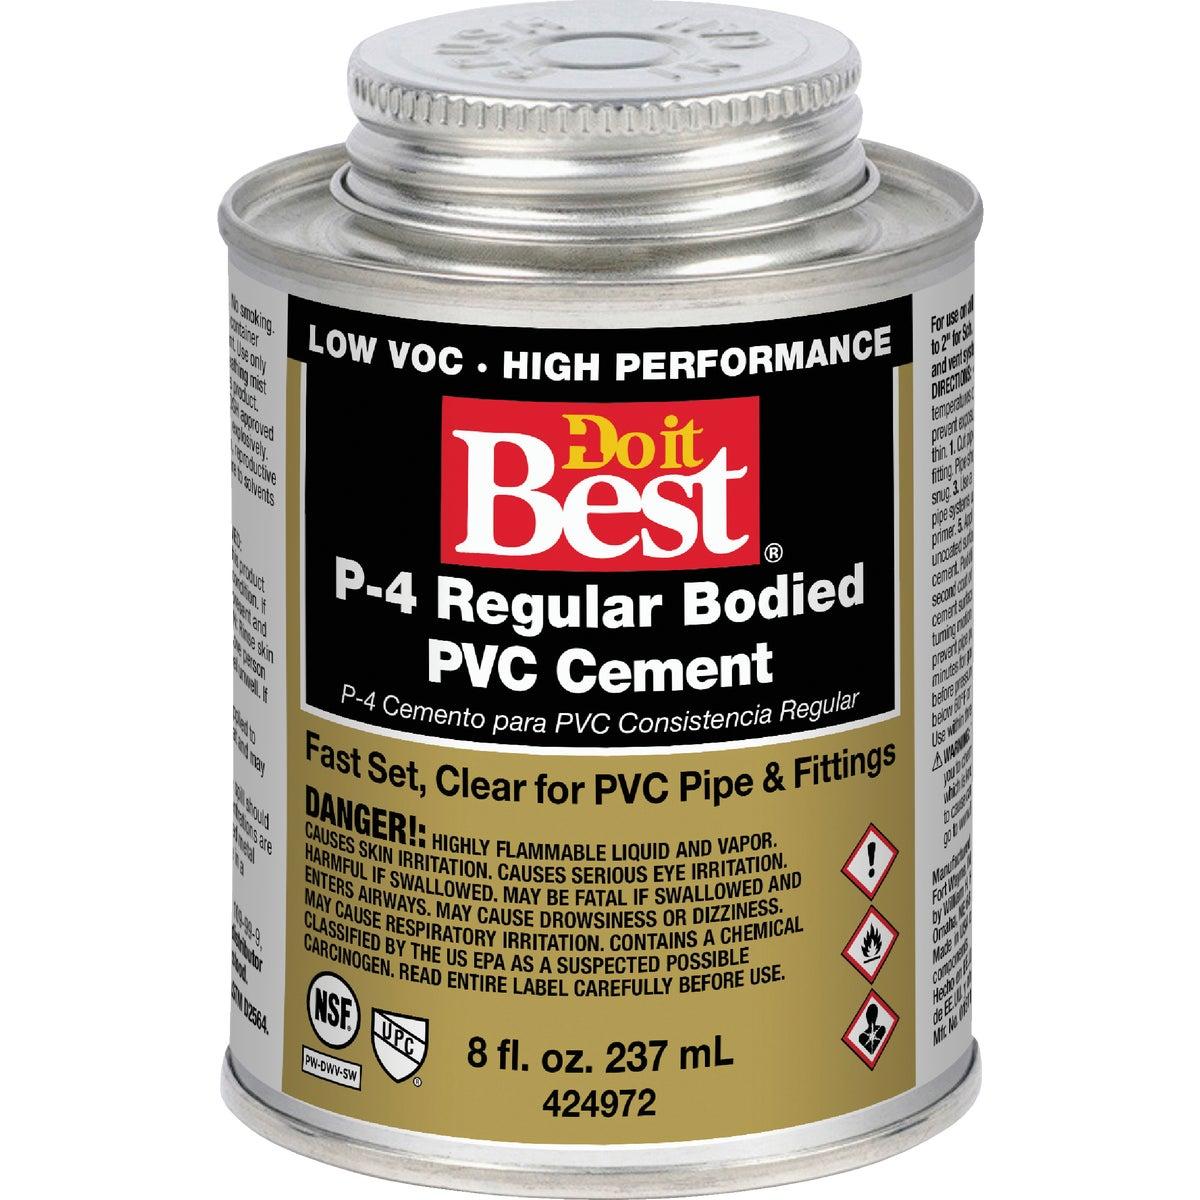 1/2PINT PVC CEMENT